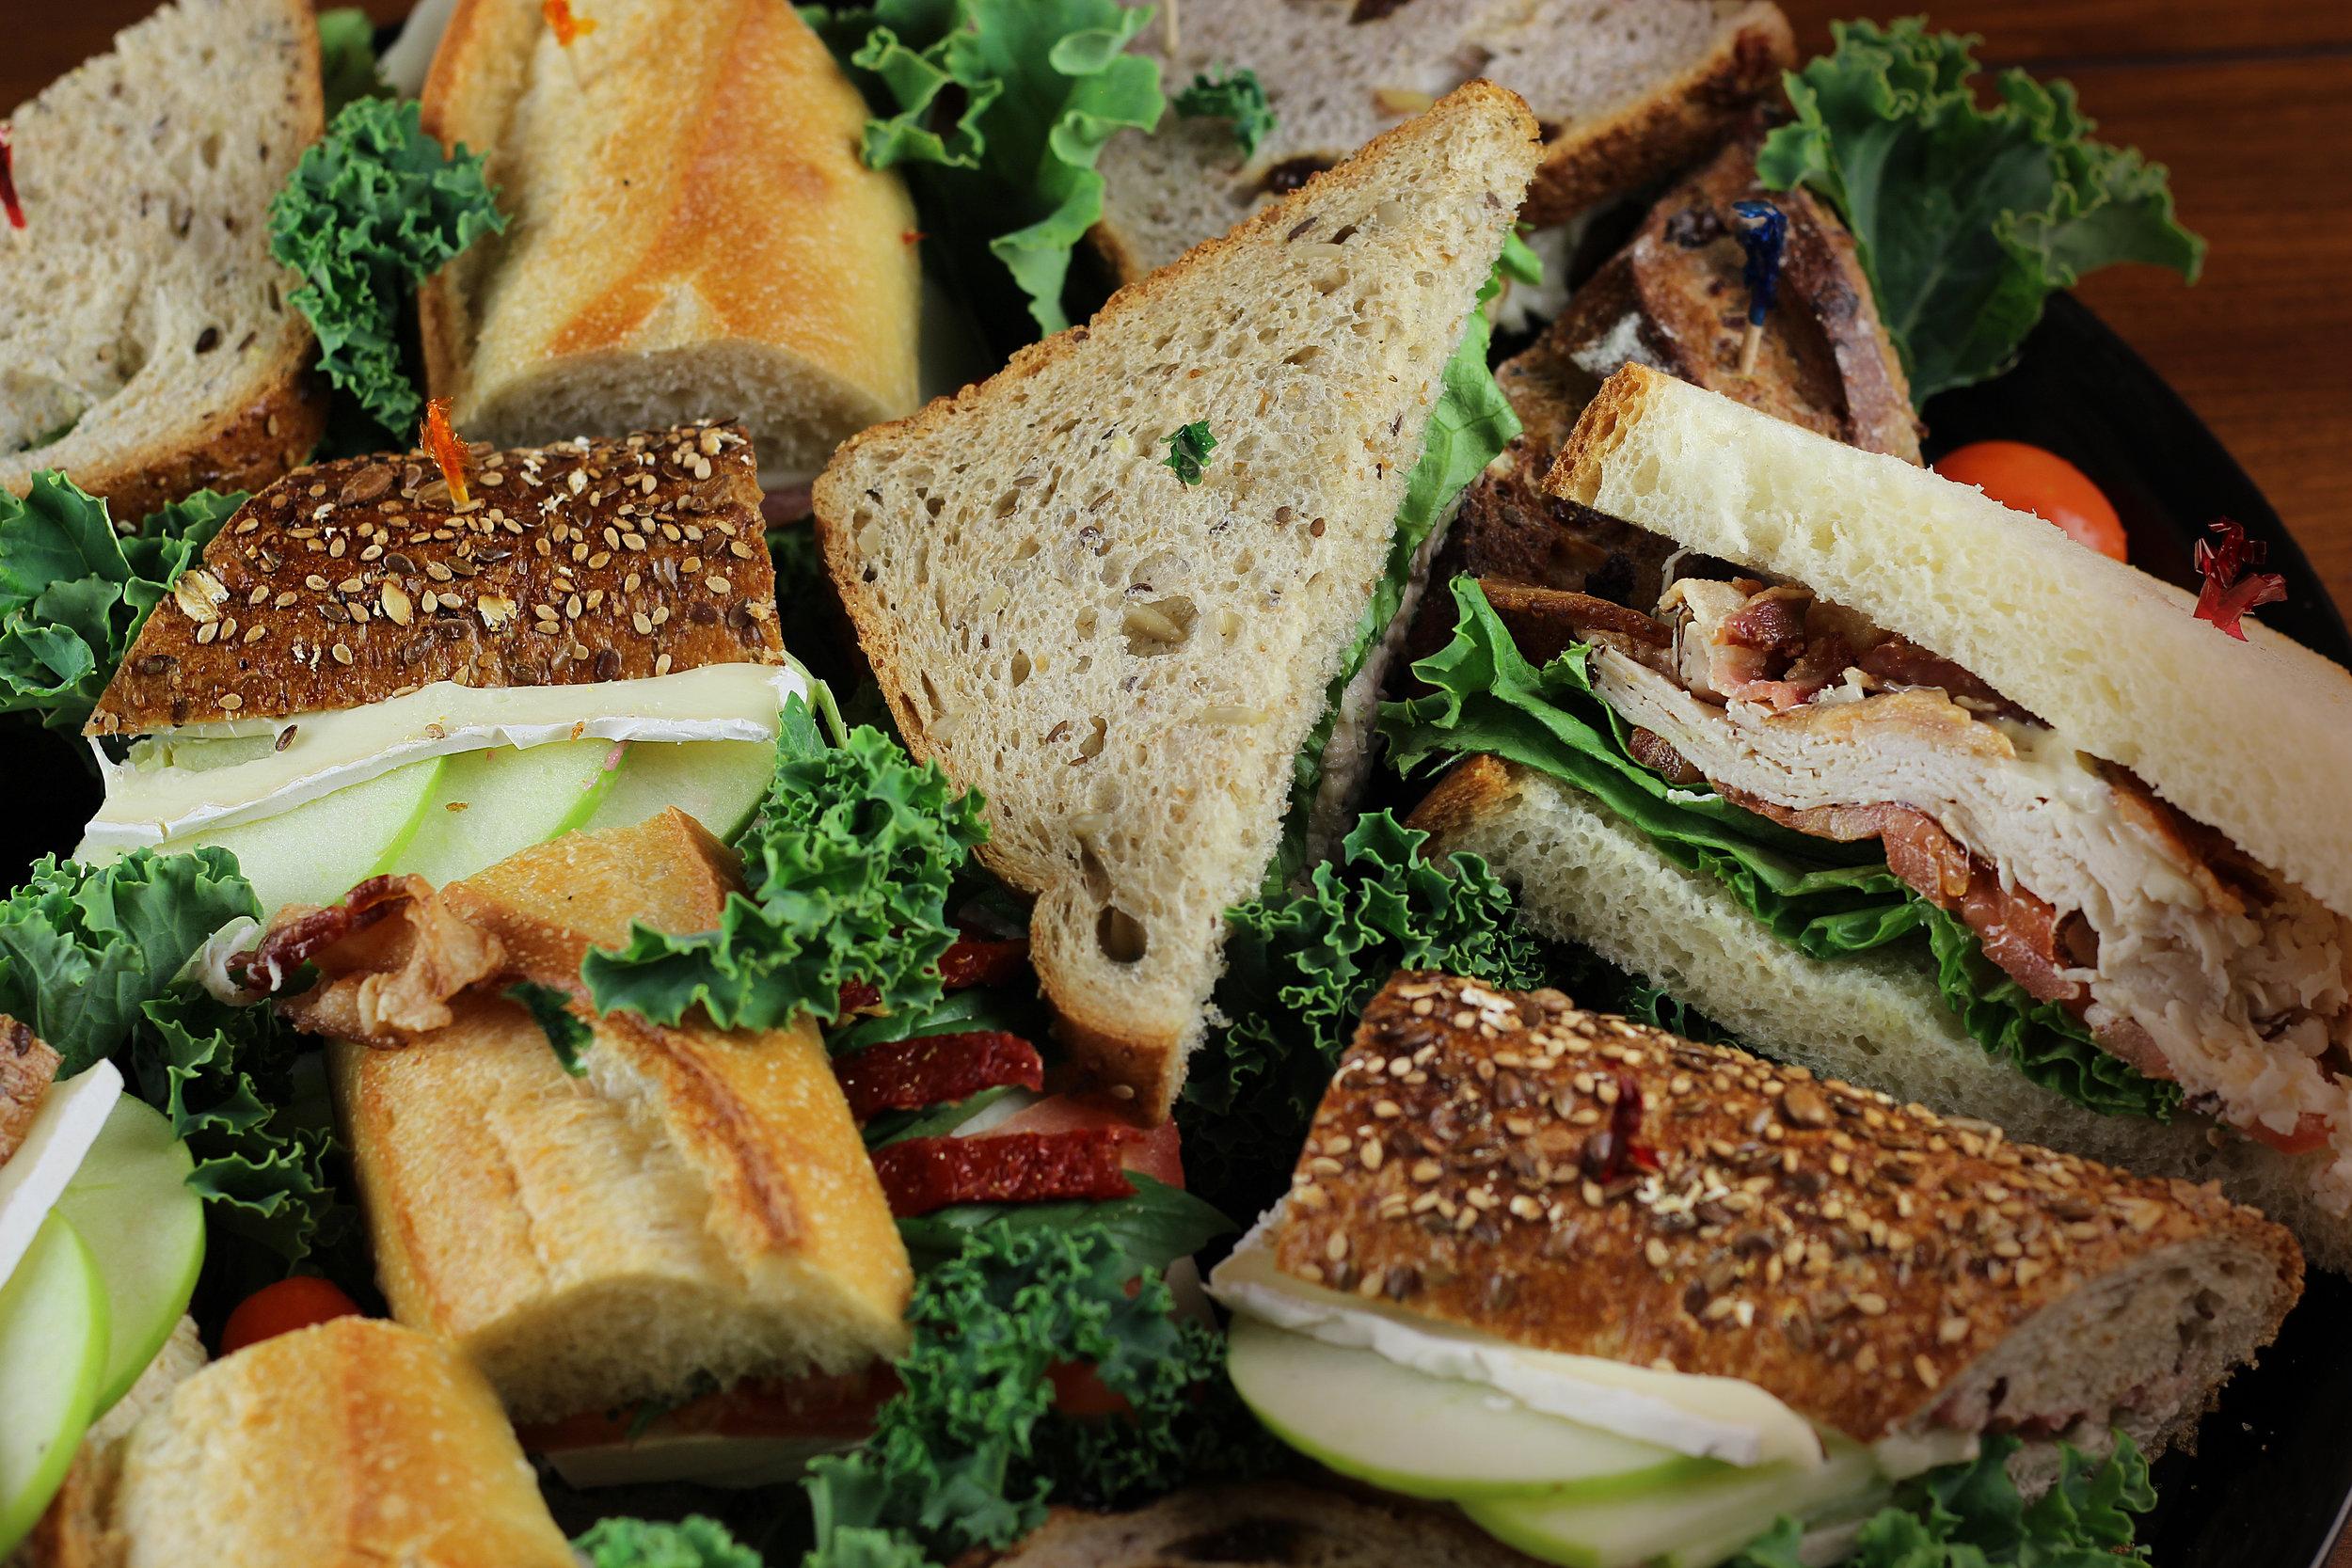 Party Platter Sandwiches 1.jpg